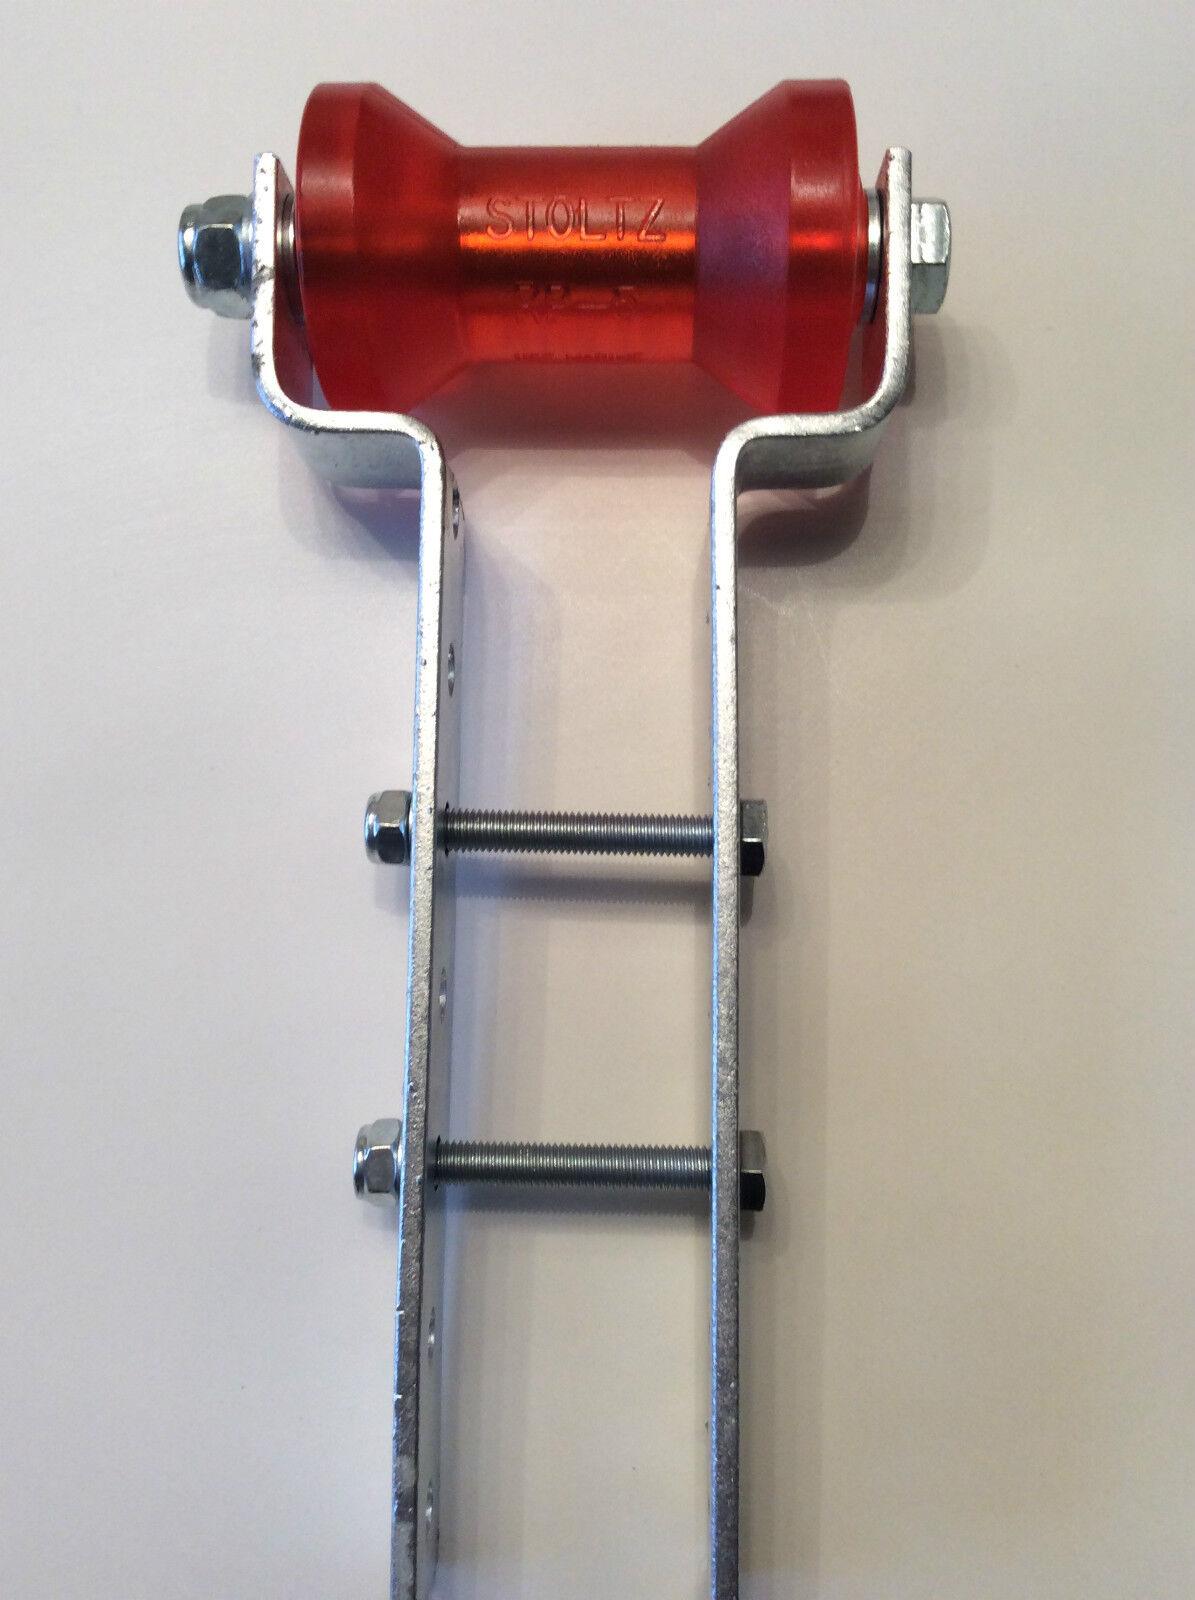 Stoltz Kielrolle Kielrollenhalter RP-5,höhenverstellbarer Kielrollenhalter Kielrolle für Stiefeltrailer,PU e748b3